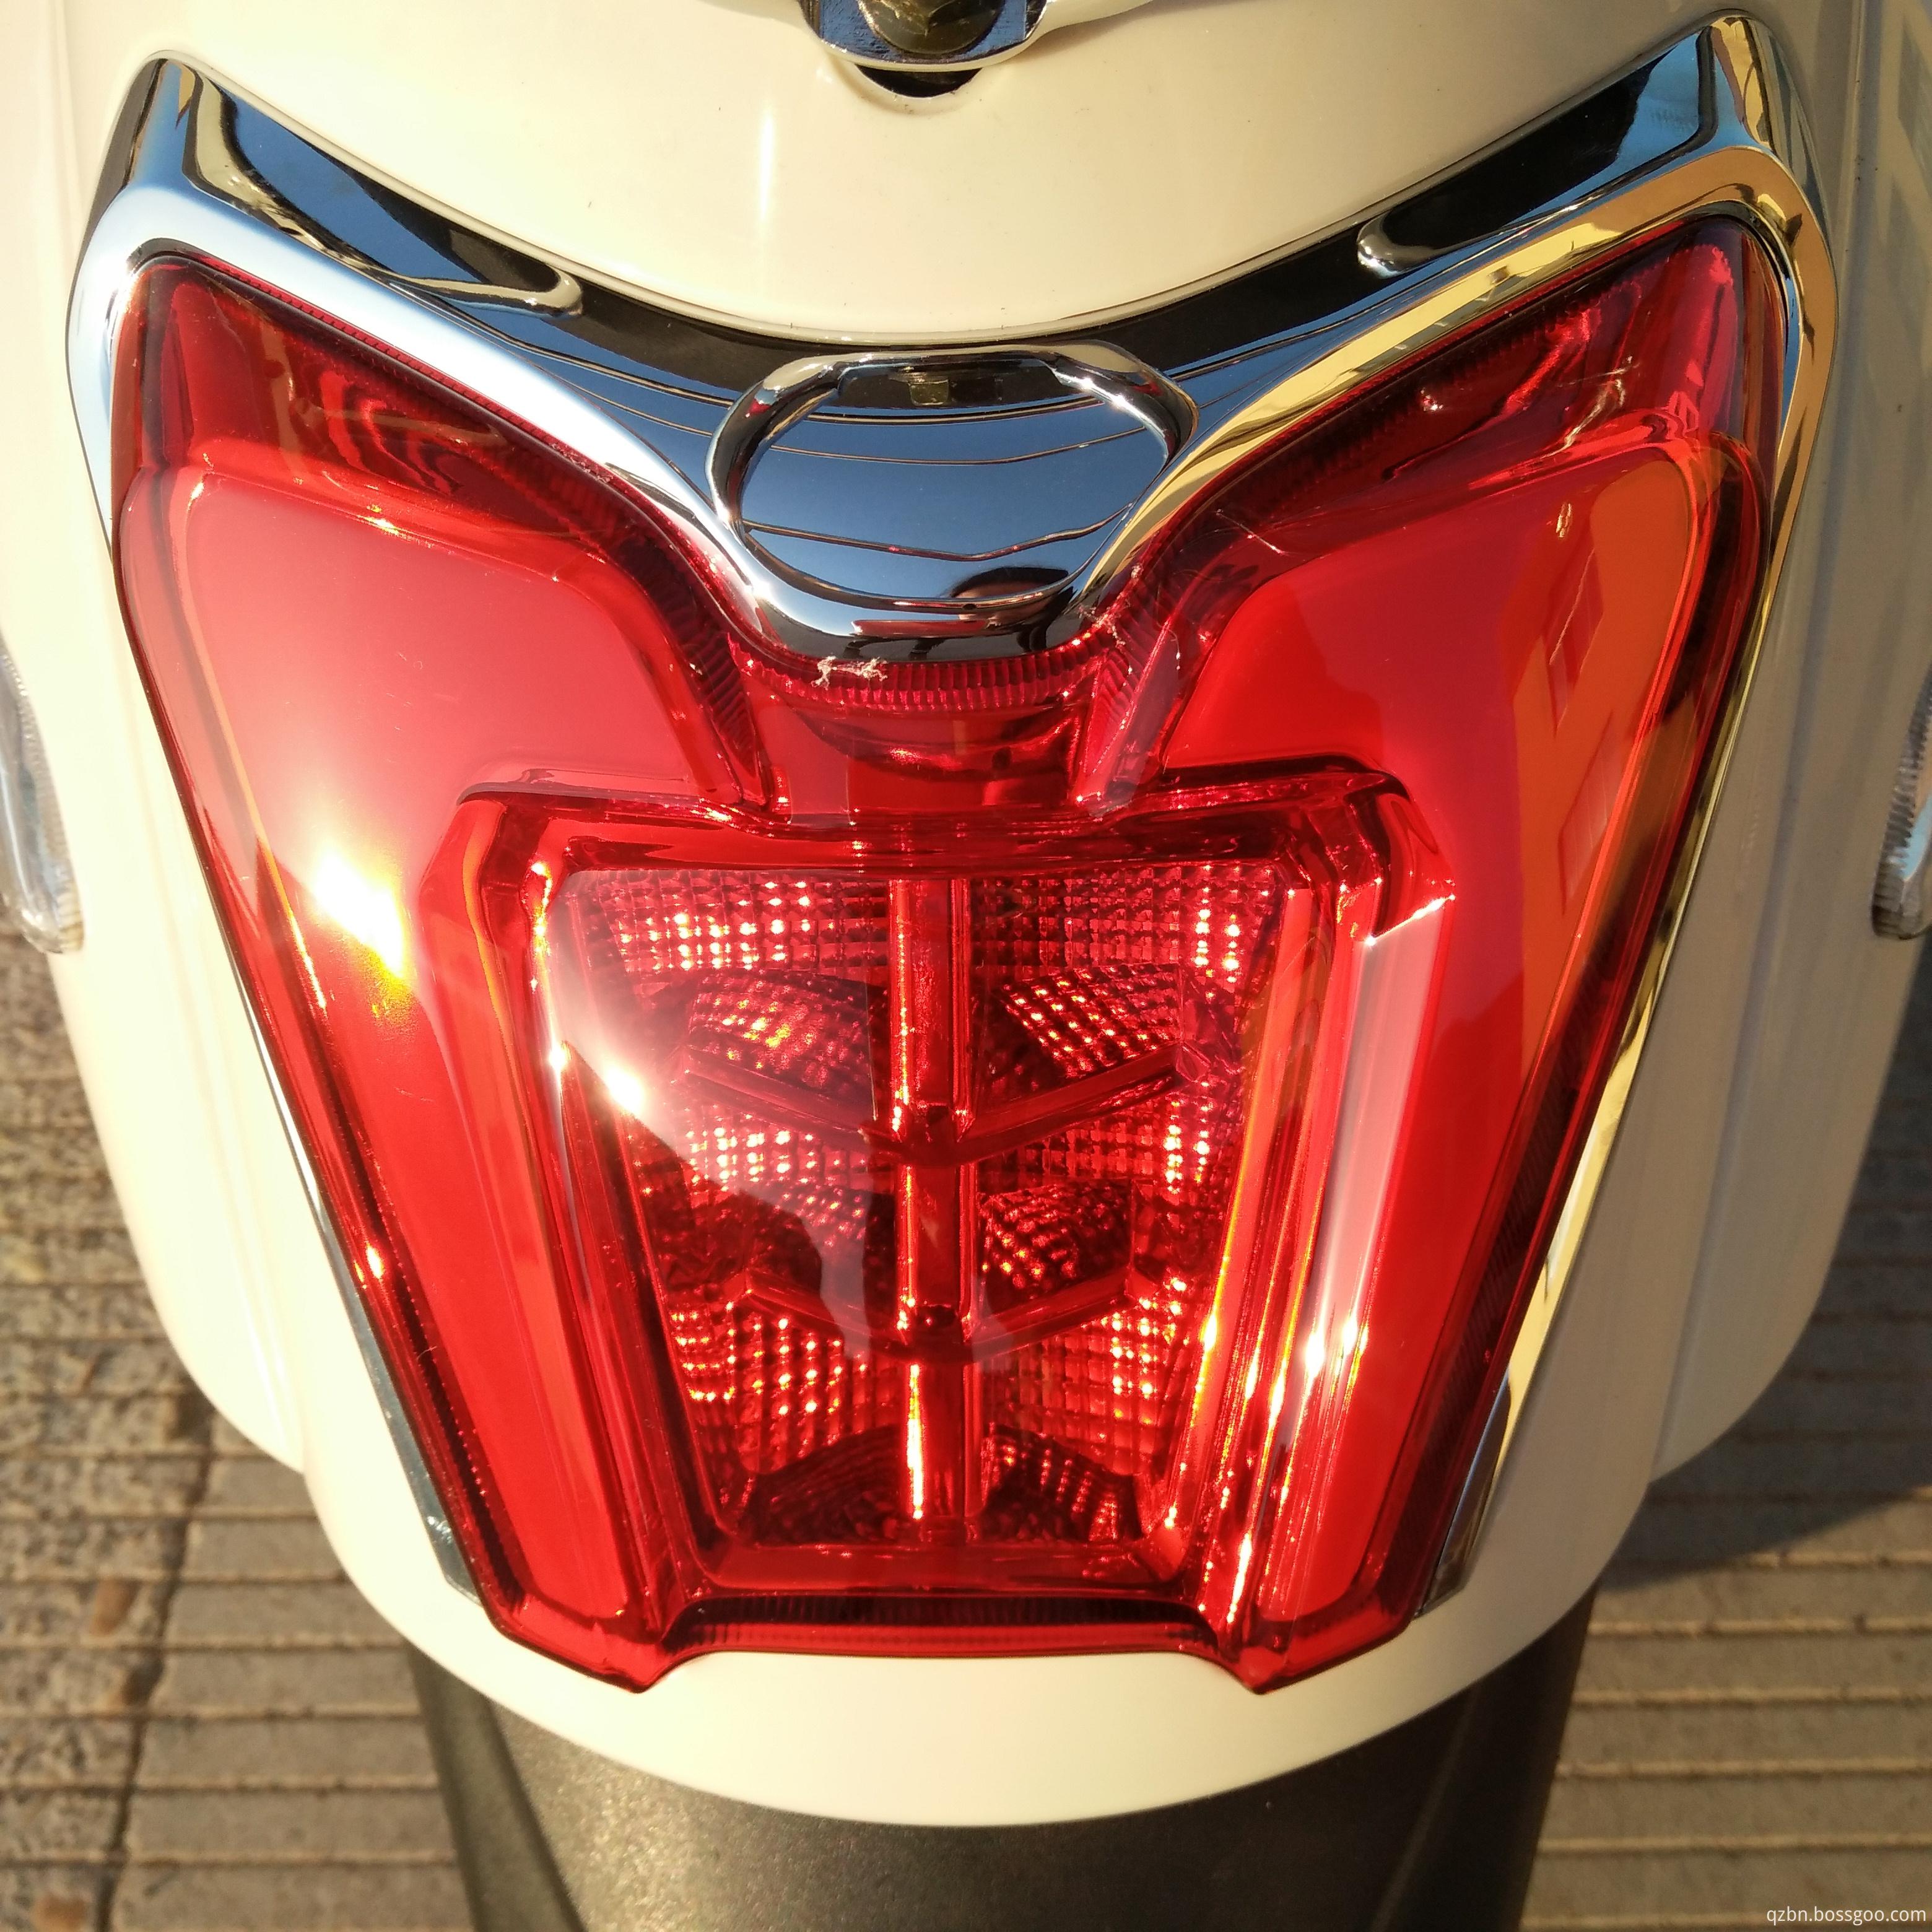 LED rear taillight